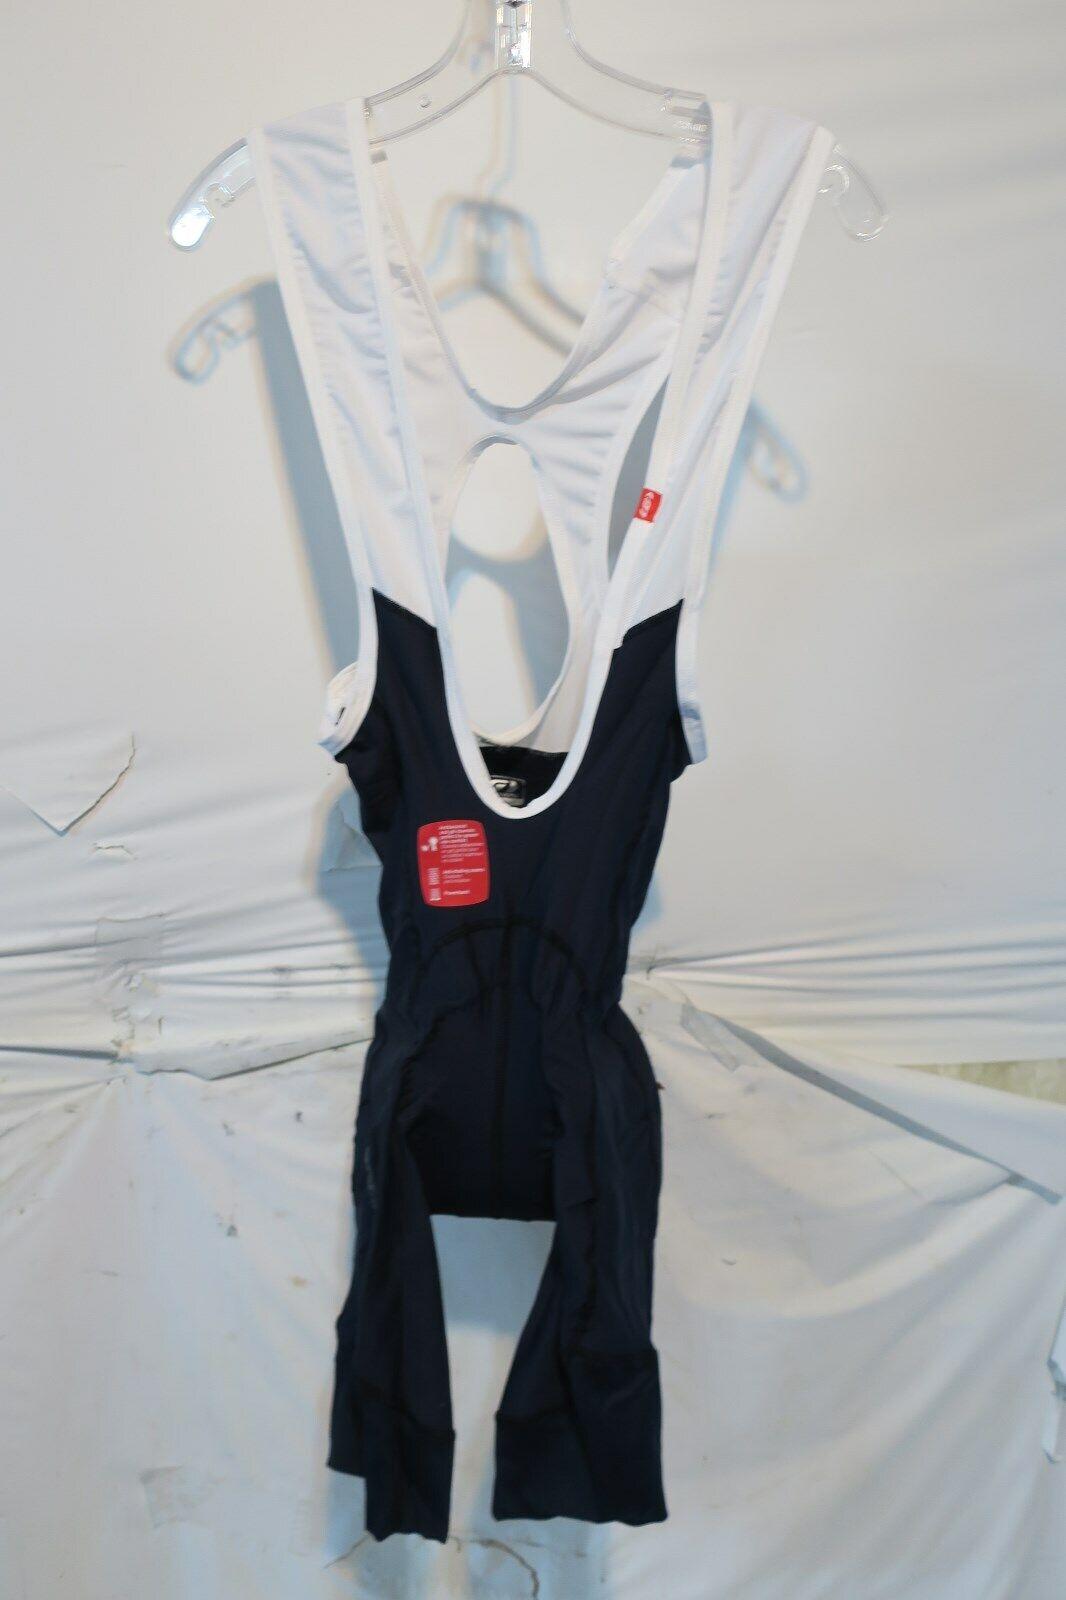 Louis Garneau Neo Power Motion Cyling Bib Shorts Men's Small Dark Knight